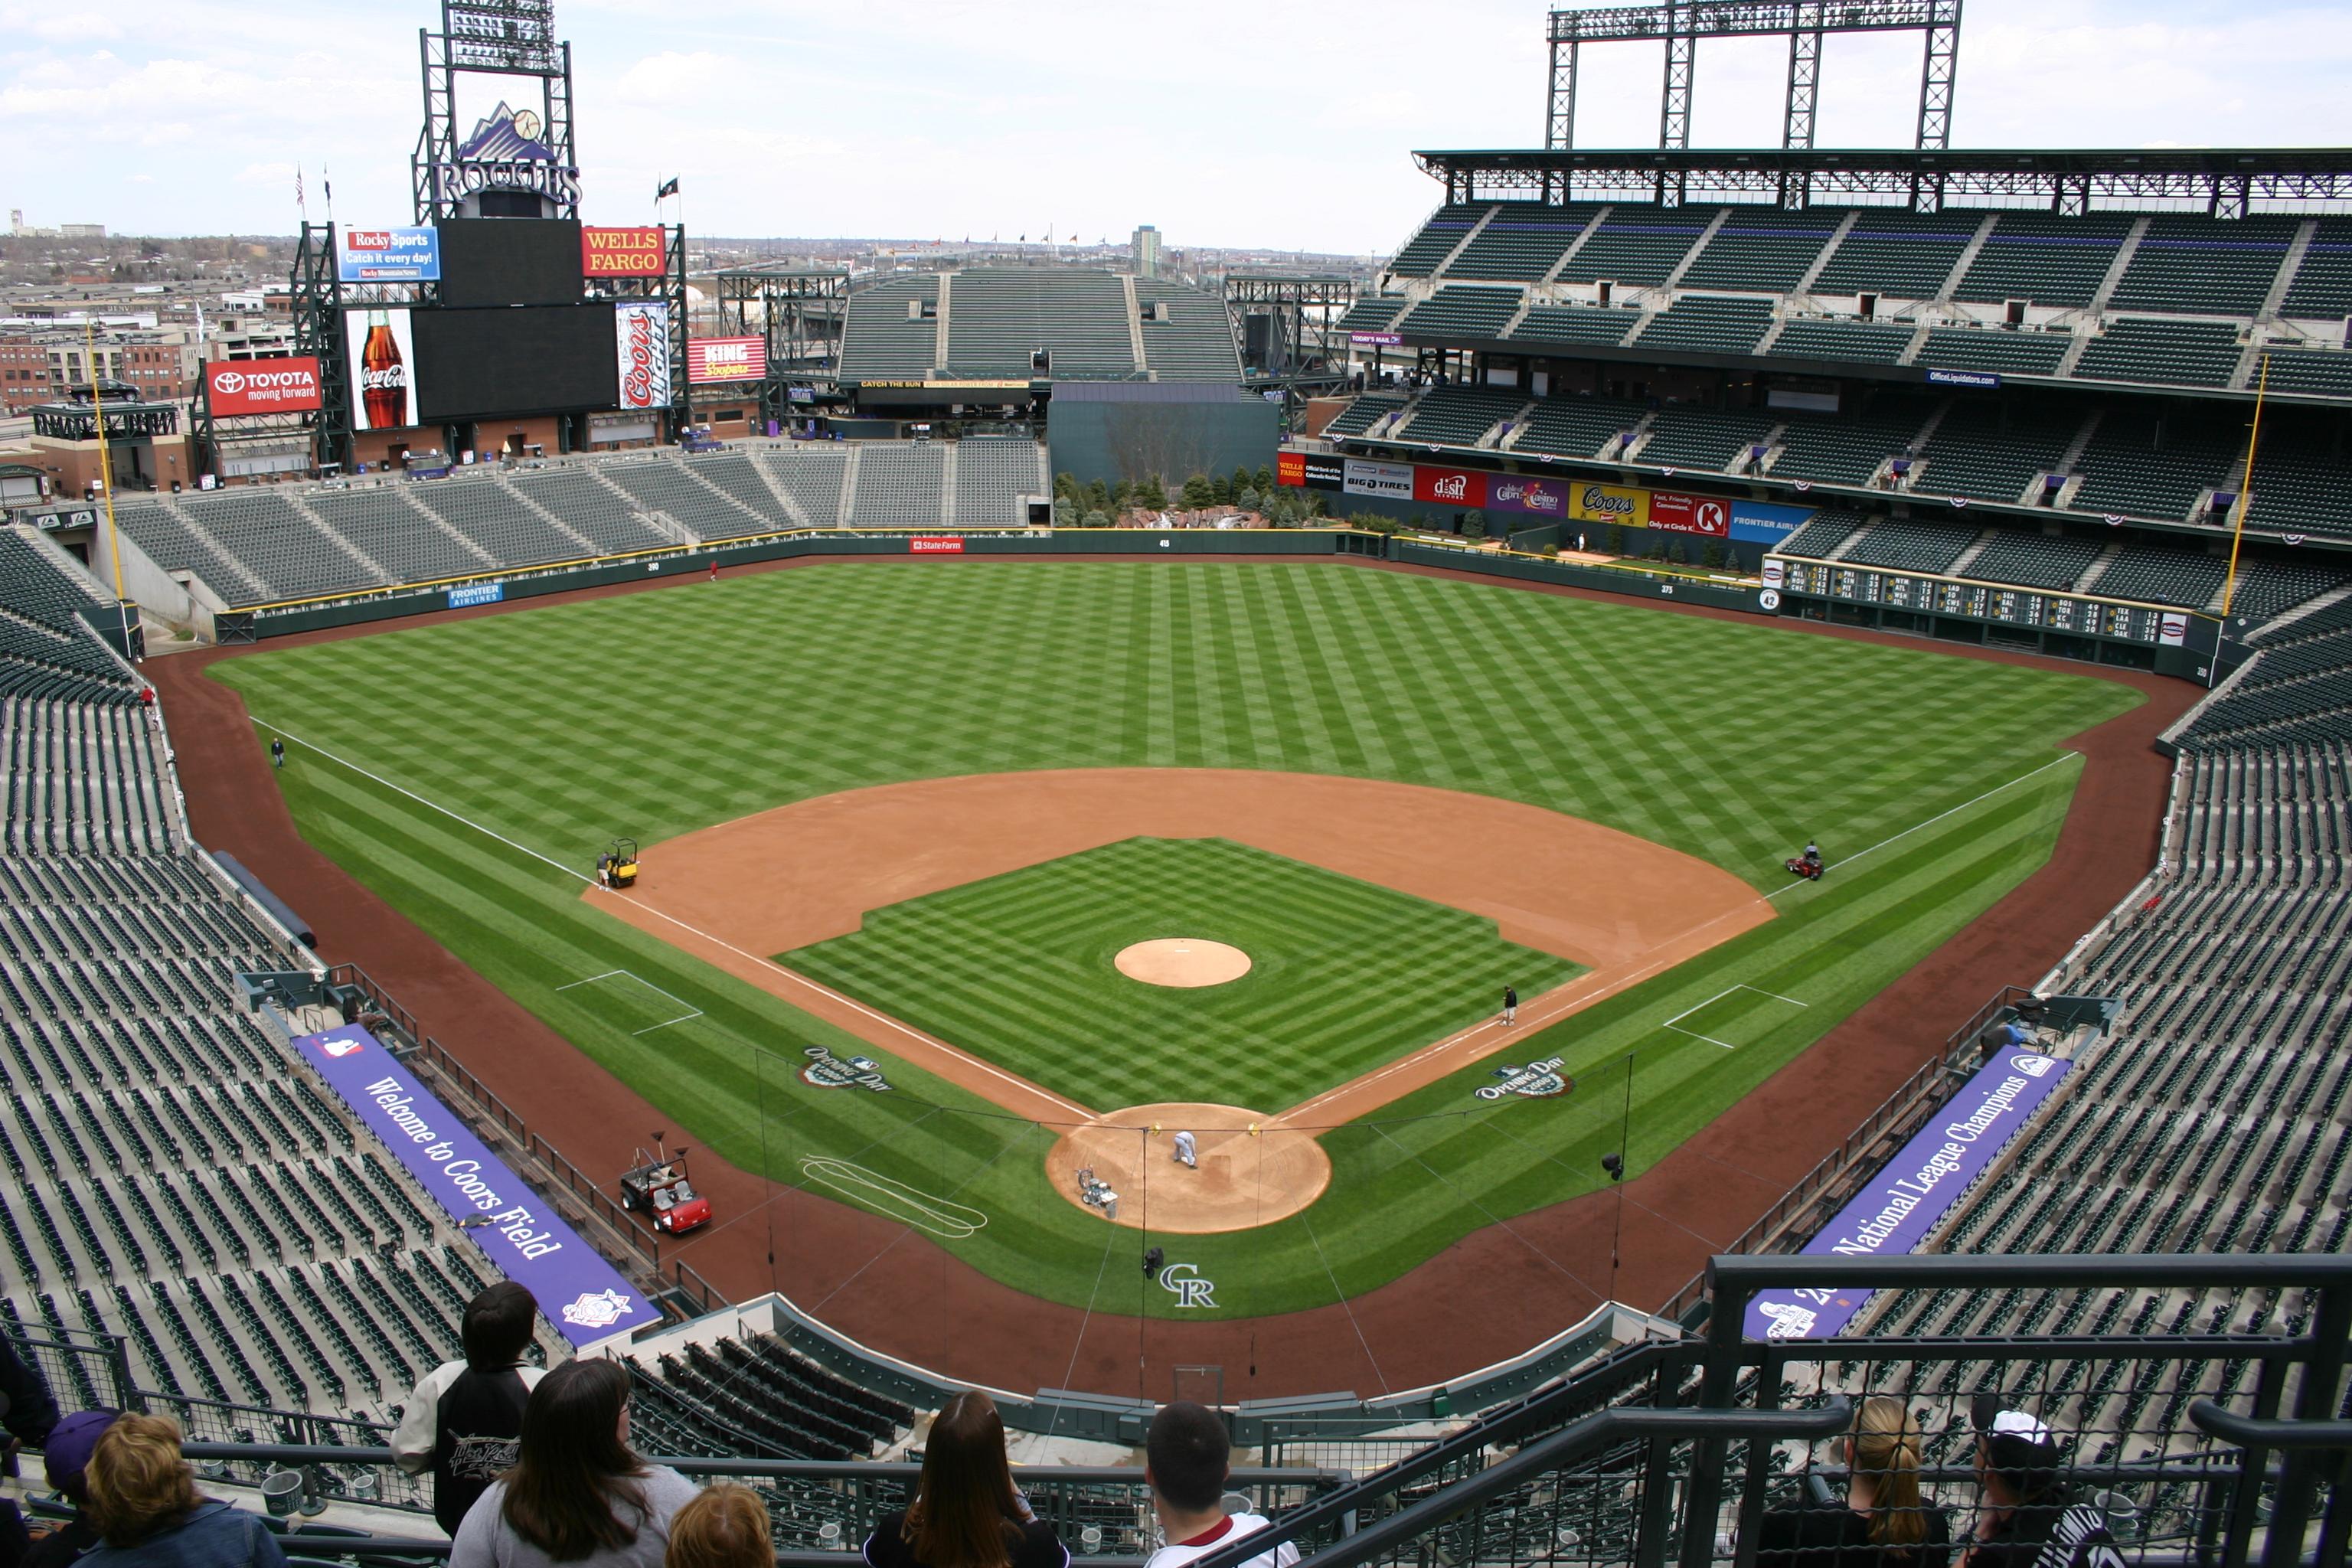 Coors Field,Rockies,baseball trips,ballpark tours,baseball stadiums